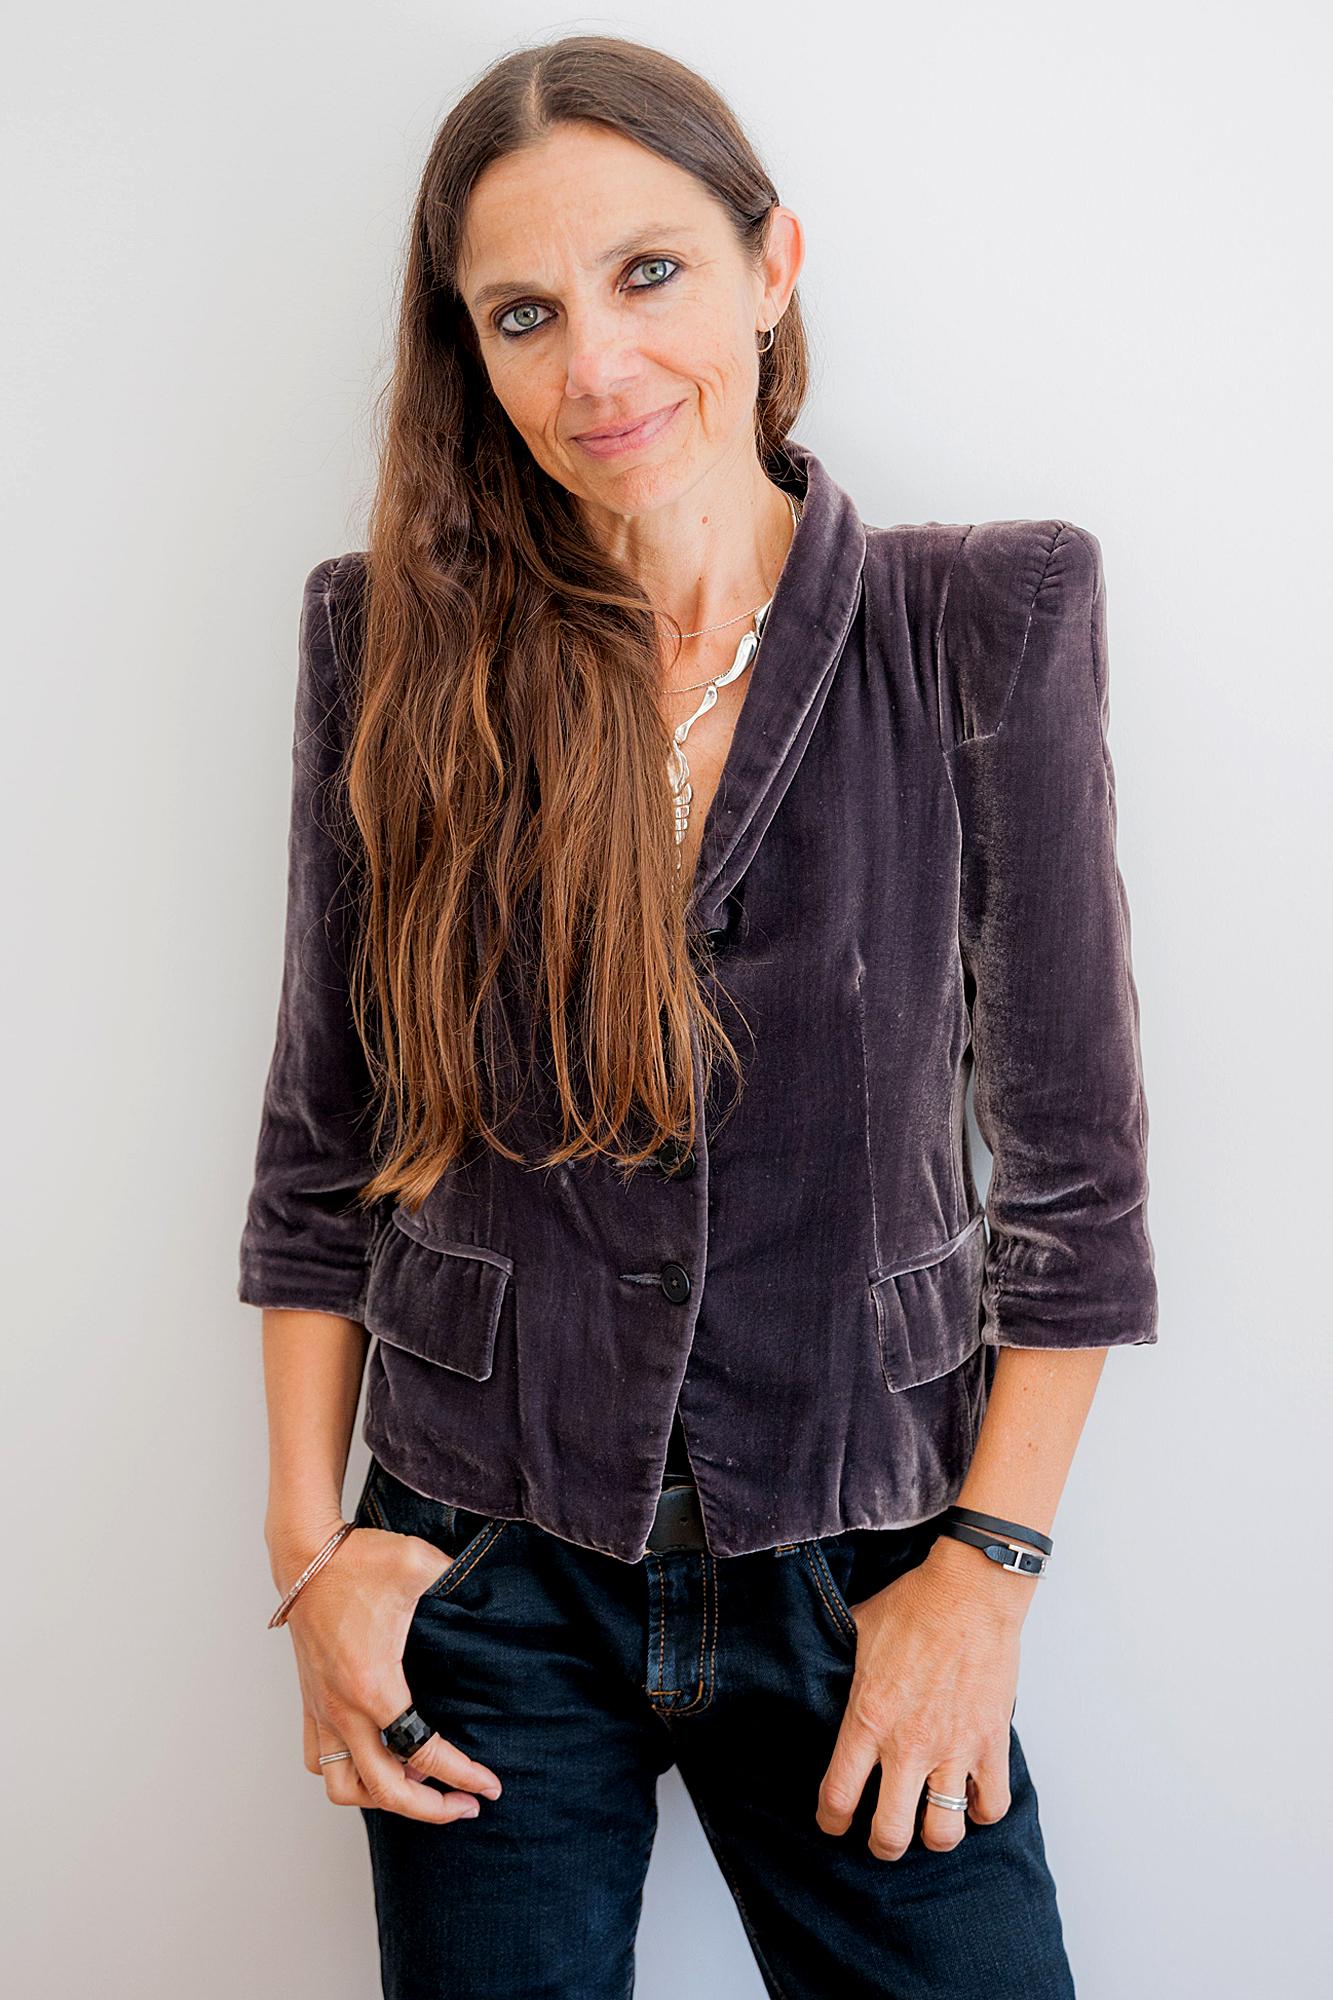 Justine Bateman portrait session, Toronto International Film Festival, Canada - 10 Sep 2017